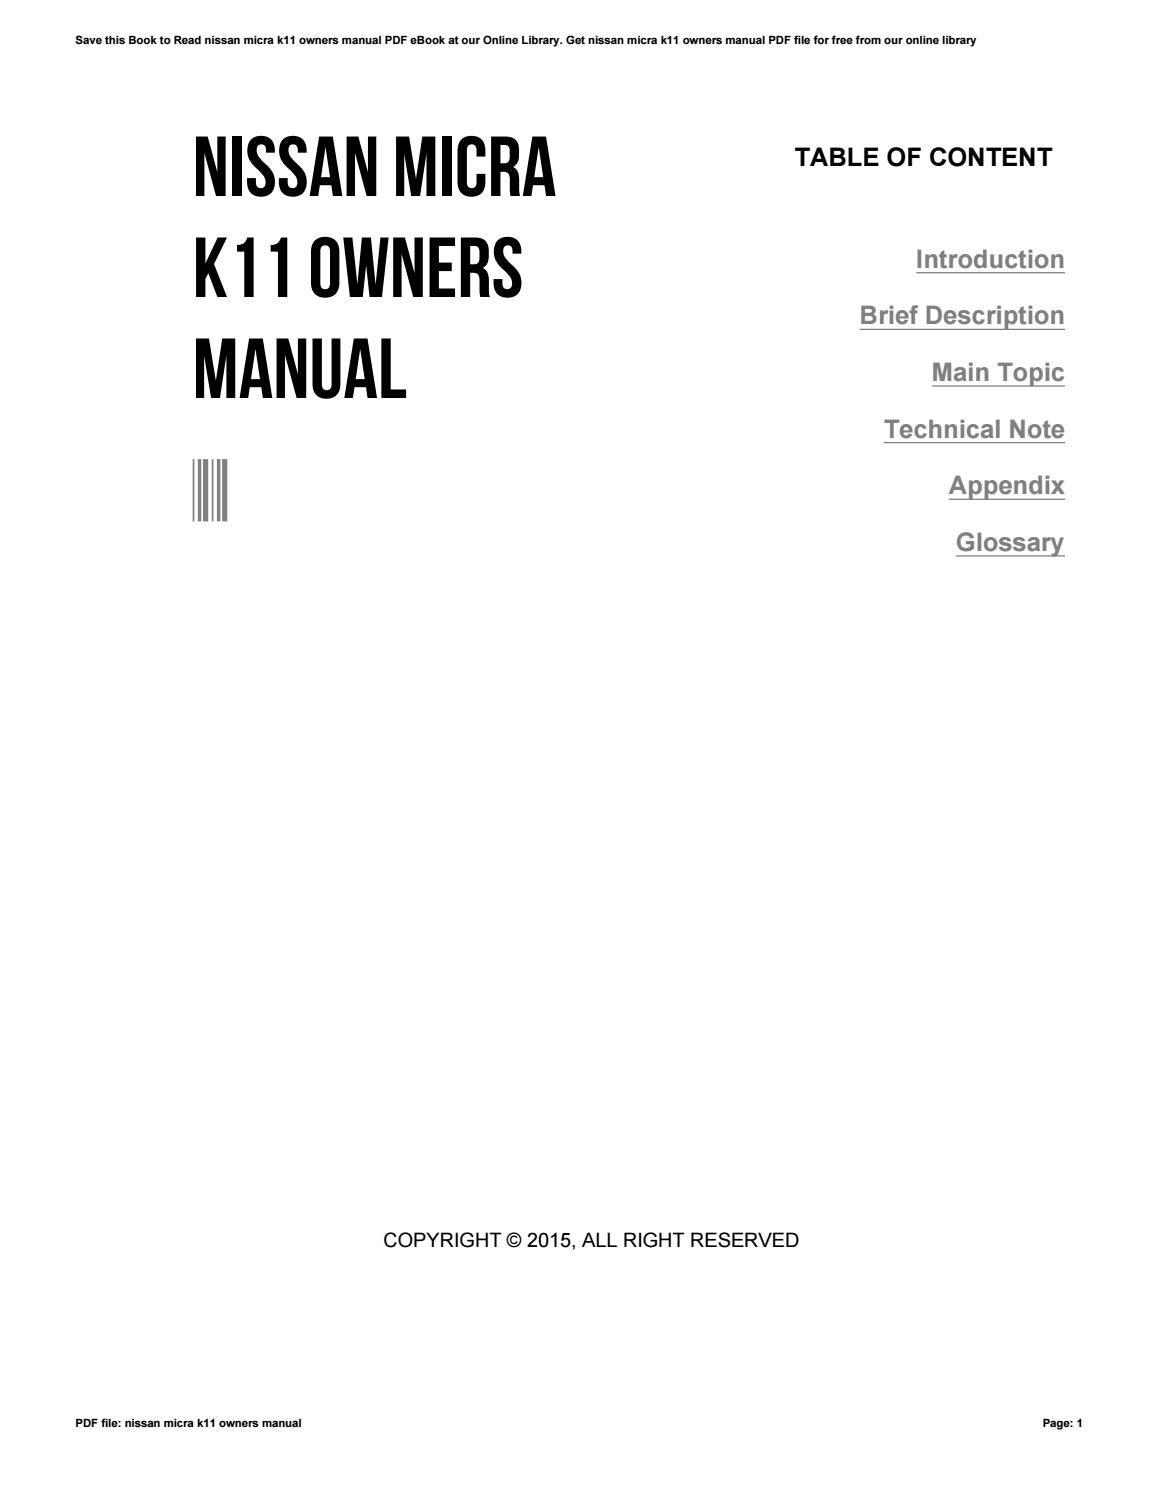 nissan micra k11 service manual